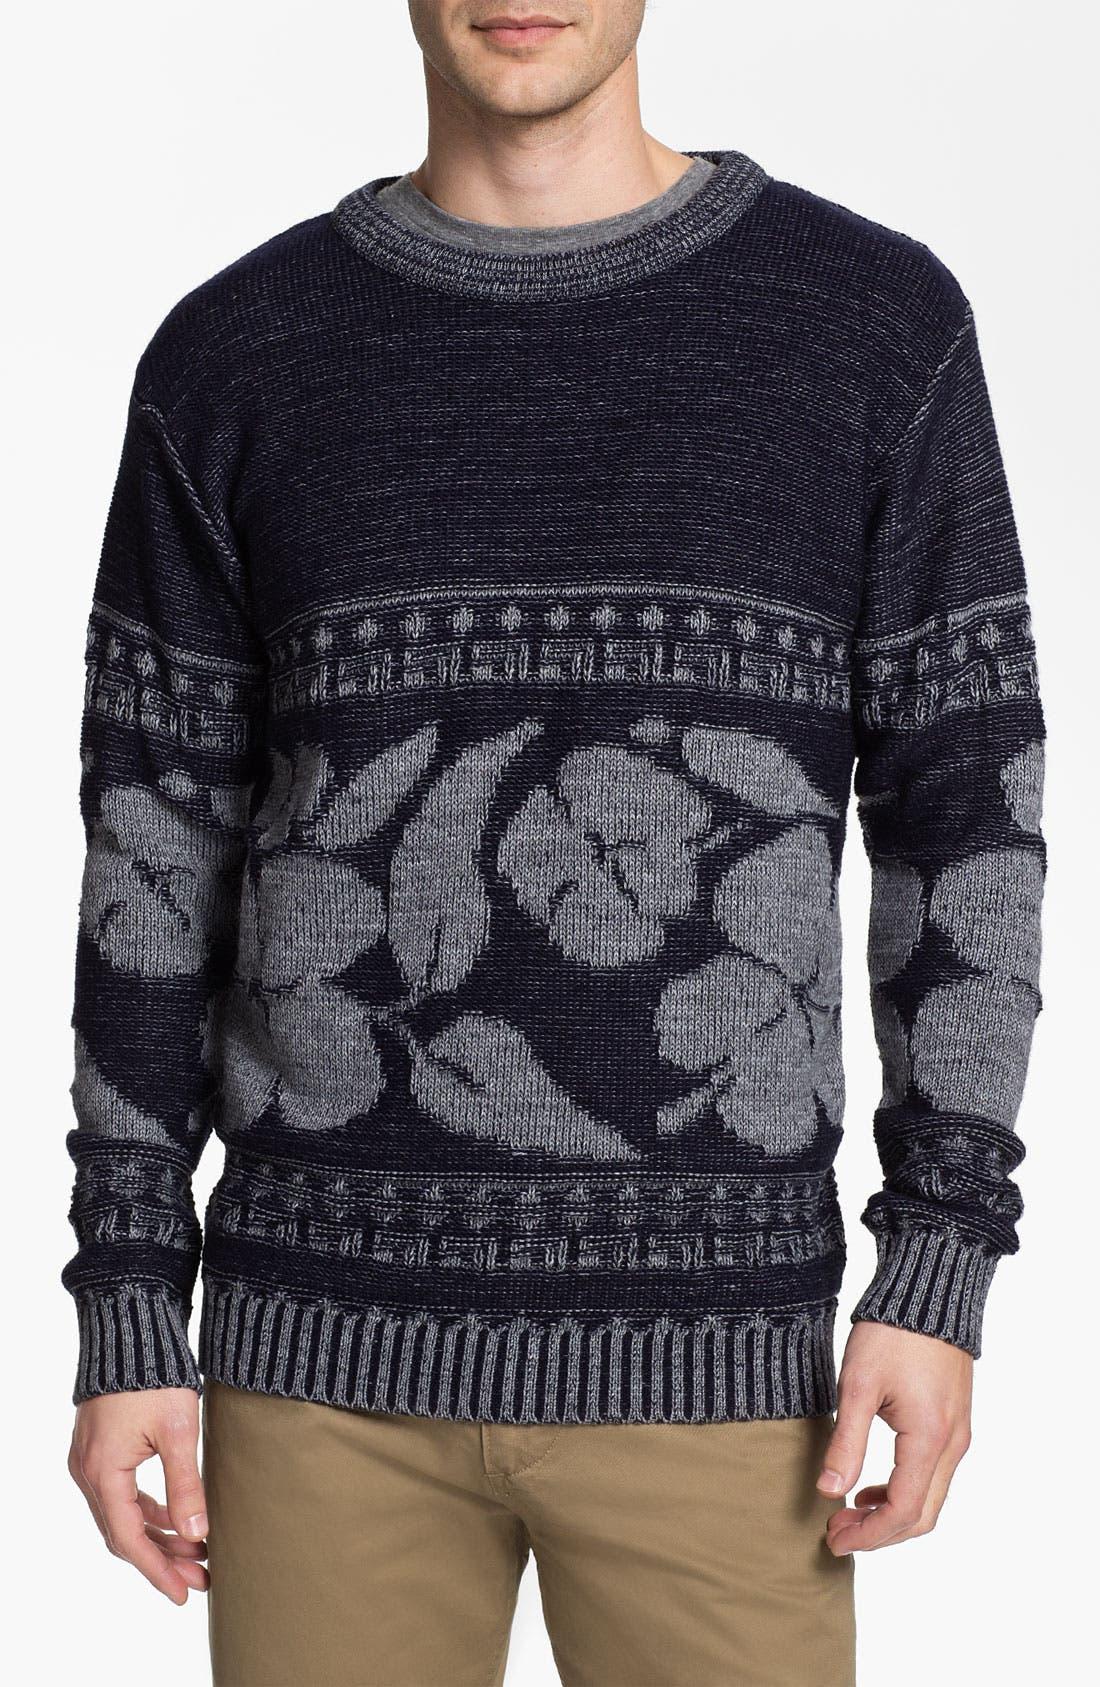 Main Image - Vanguard 'Hibiscus' Crewneck Sweater